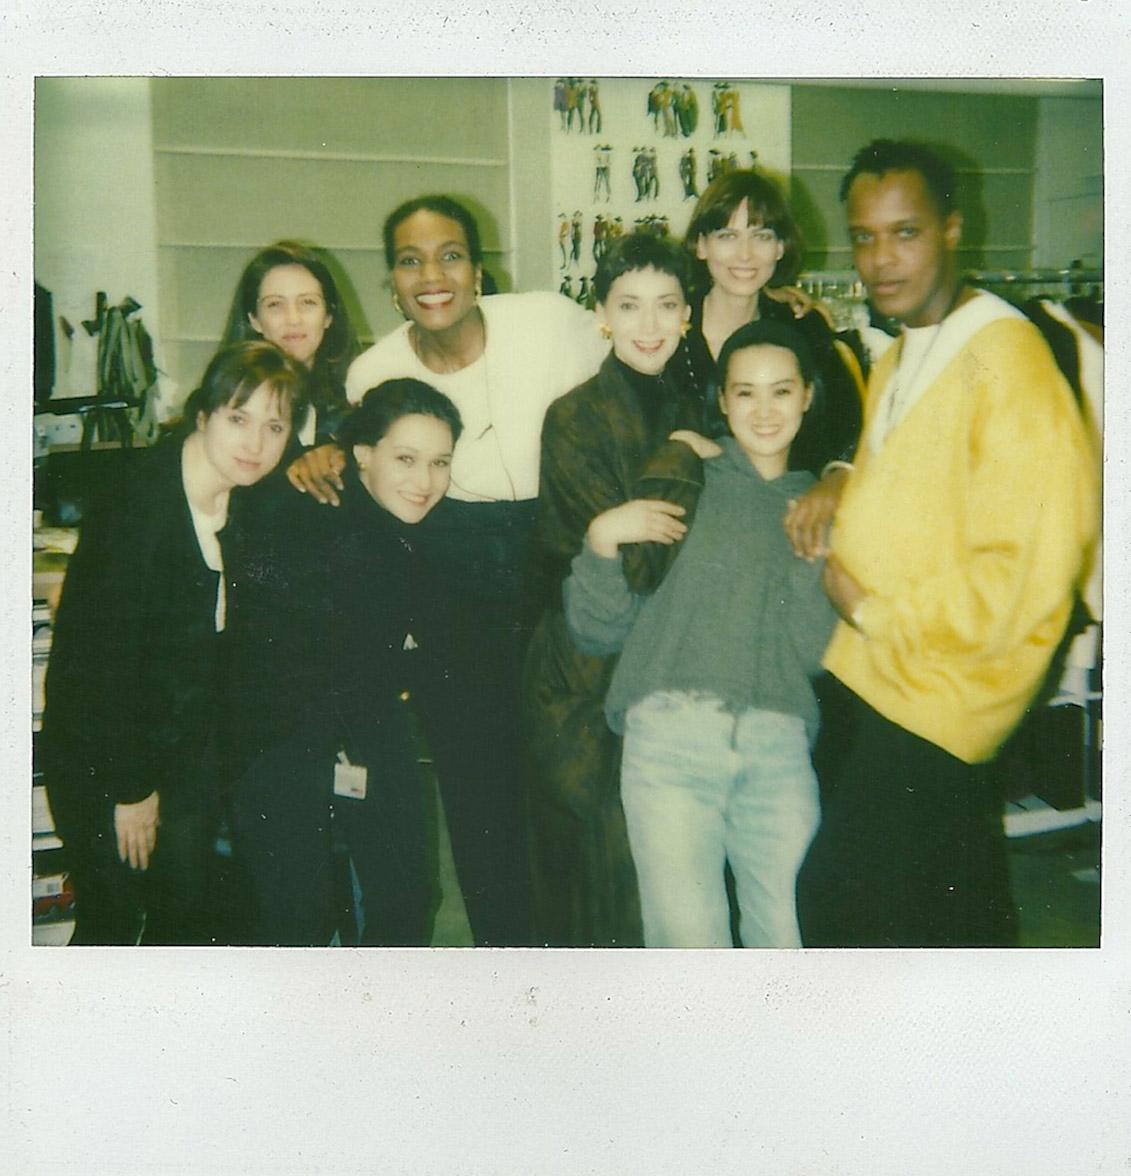 Donna Karan's design team: Xiomara Grosset, Edward Wilkerson and Carmen Artigas. Fit models Doreen and Gina Di Berardo. Textile team, Cristina Azario and Michelle Hrynda.